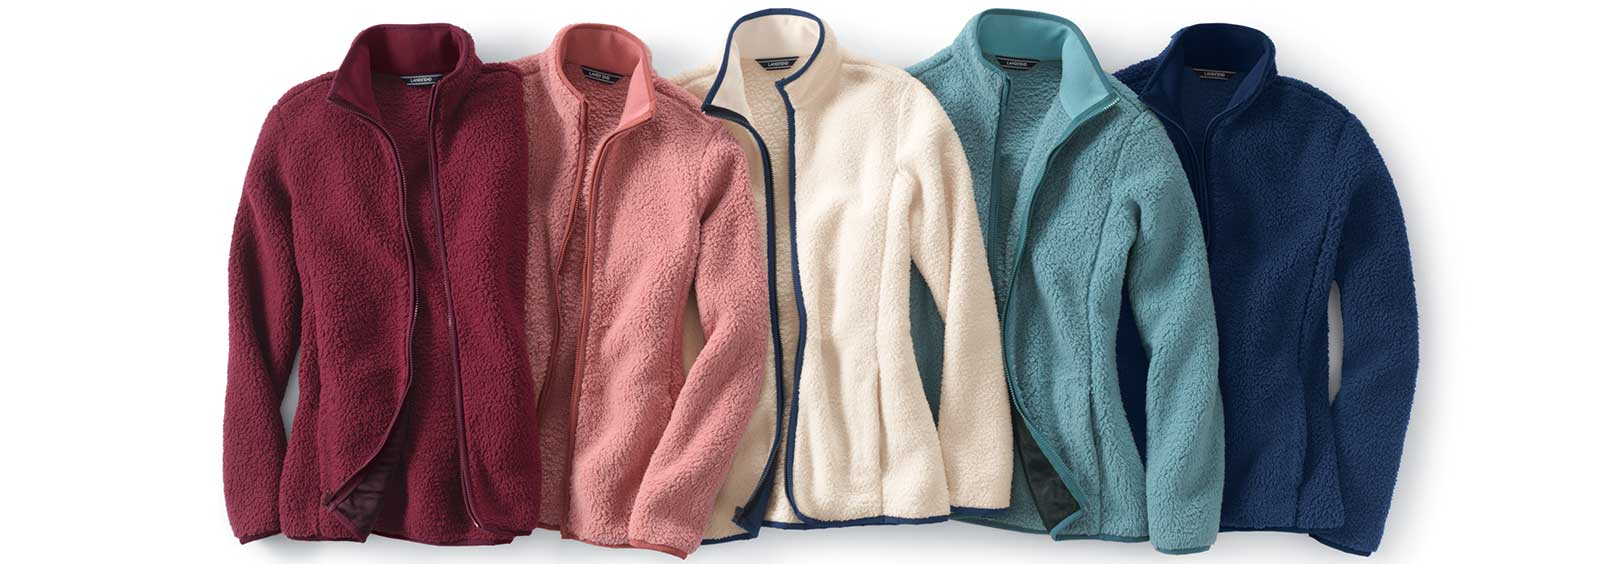 How fleece jackets went from outdoor necessity to everyday wear